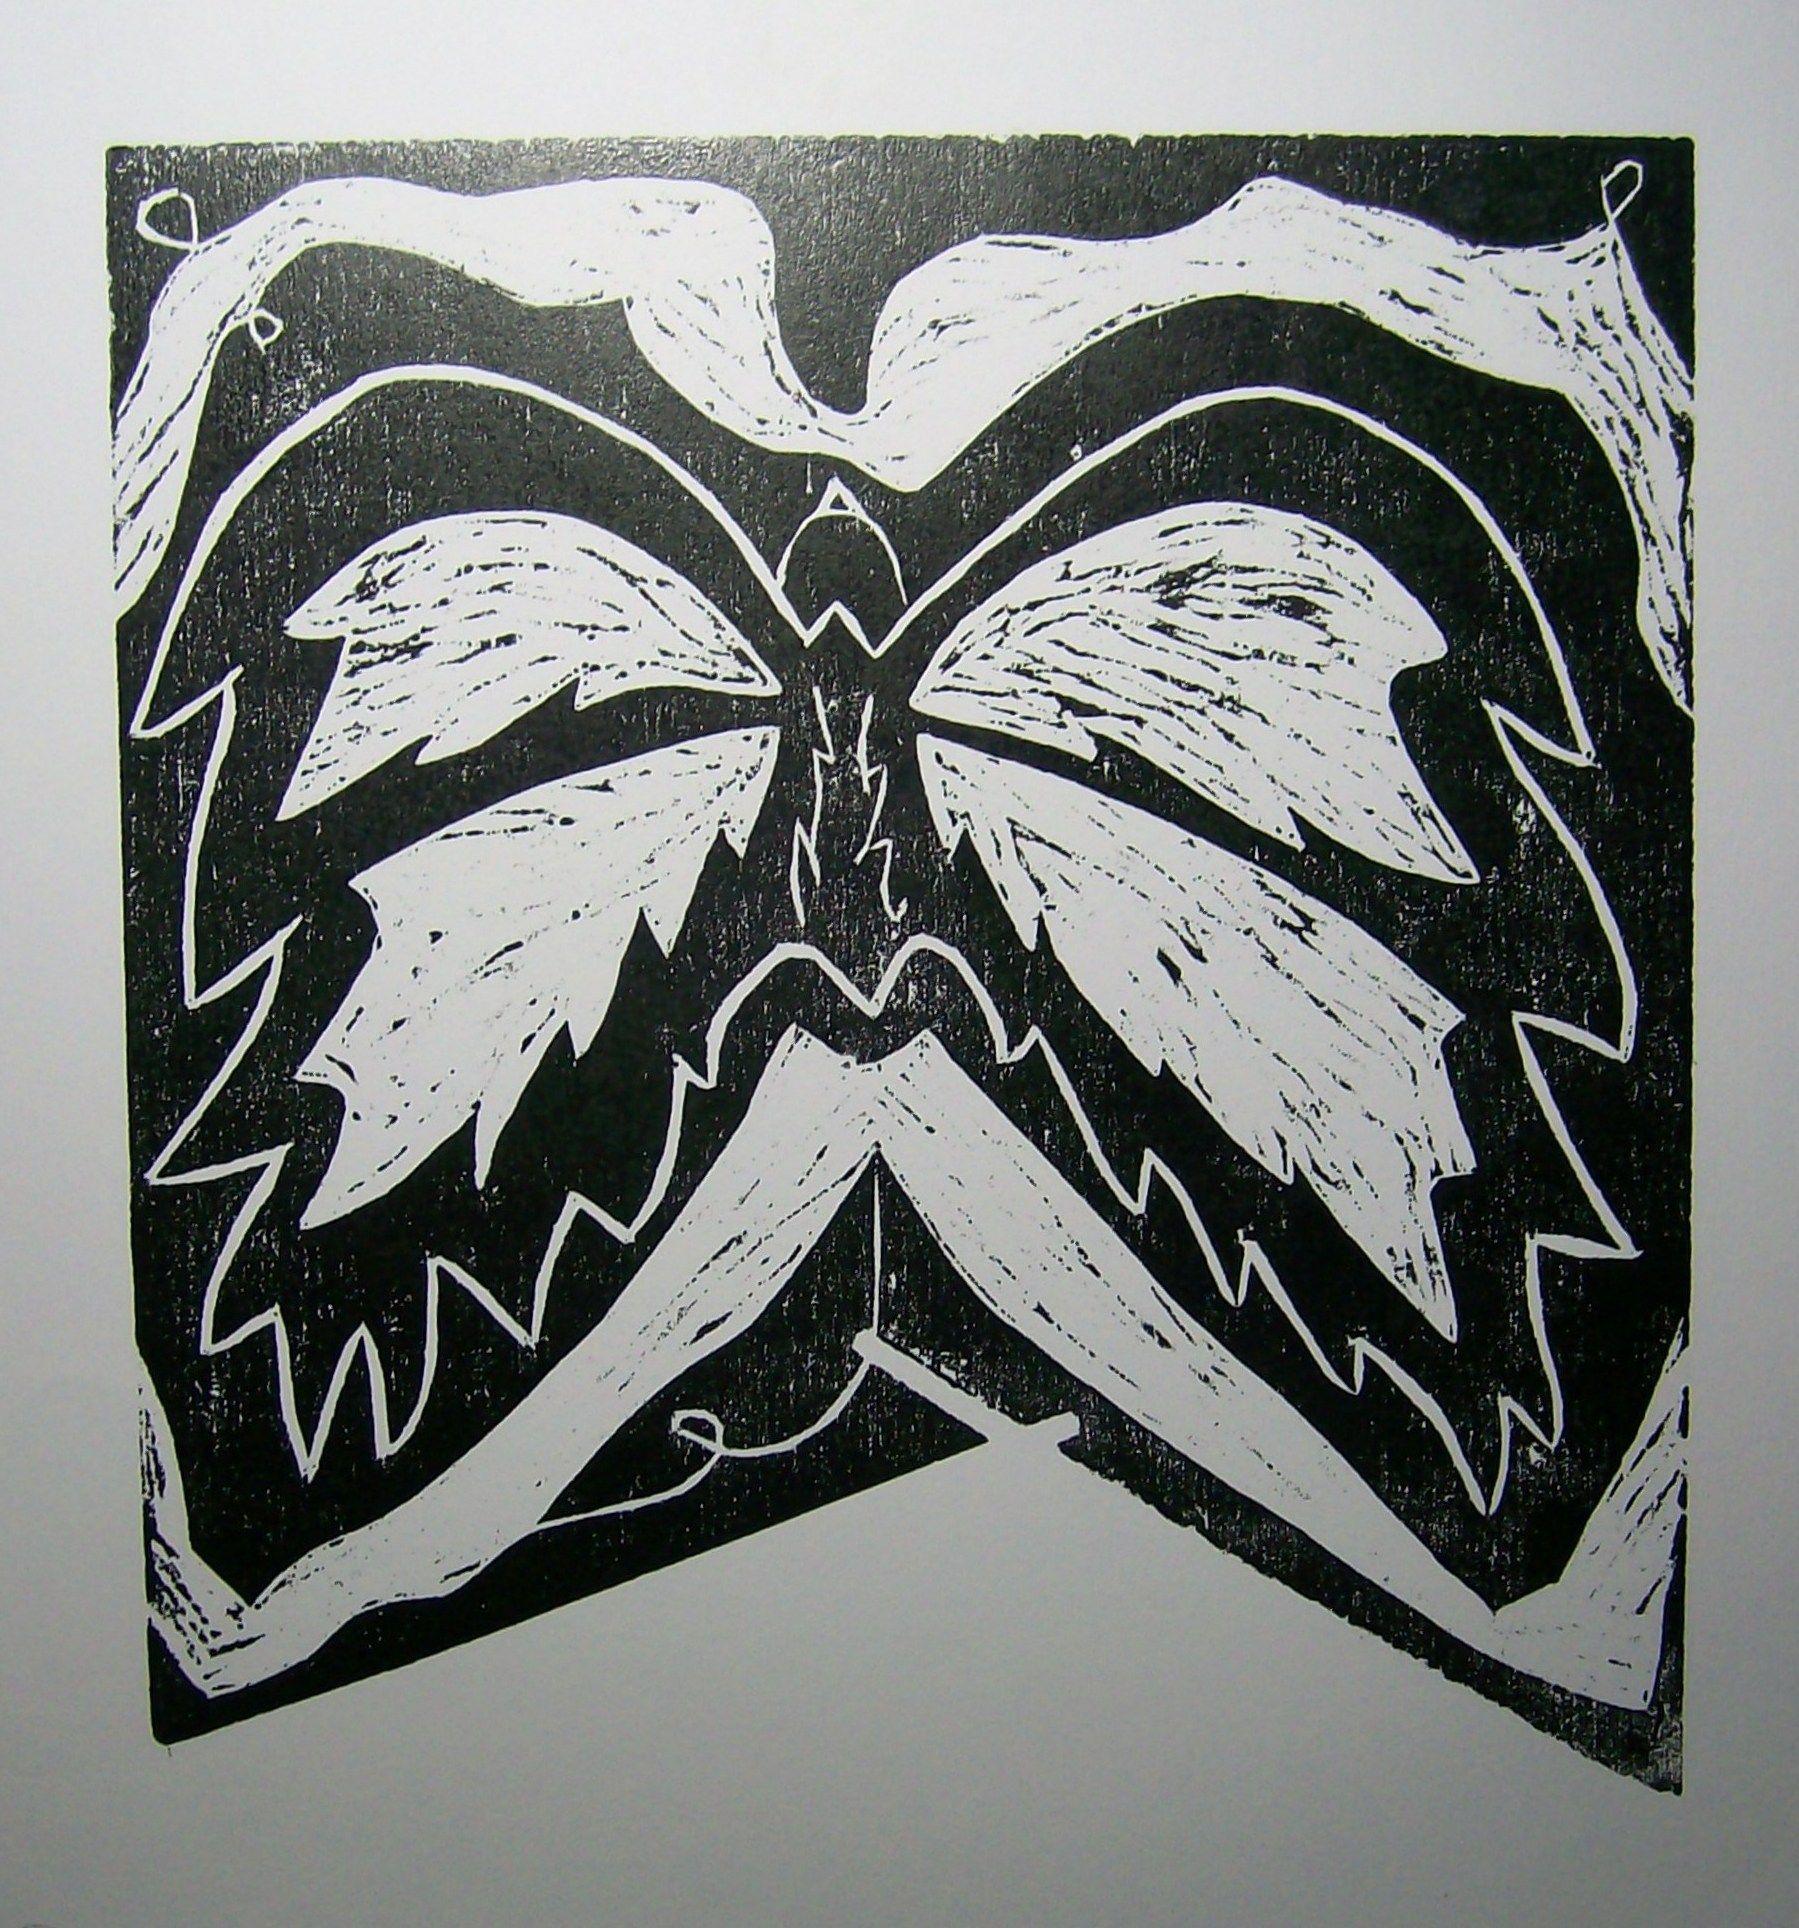 Grabado en tinta negra